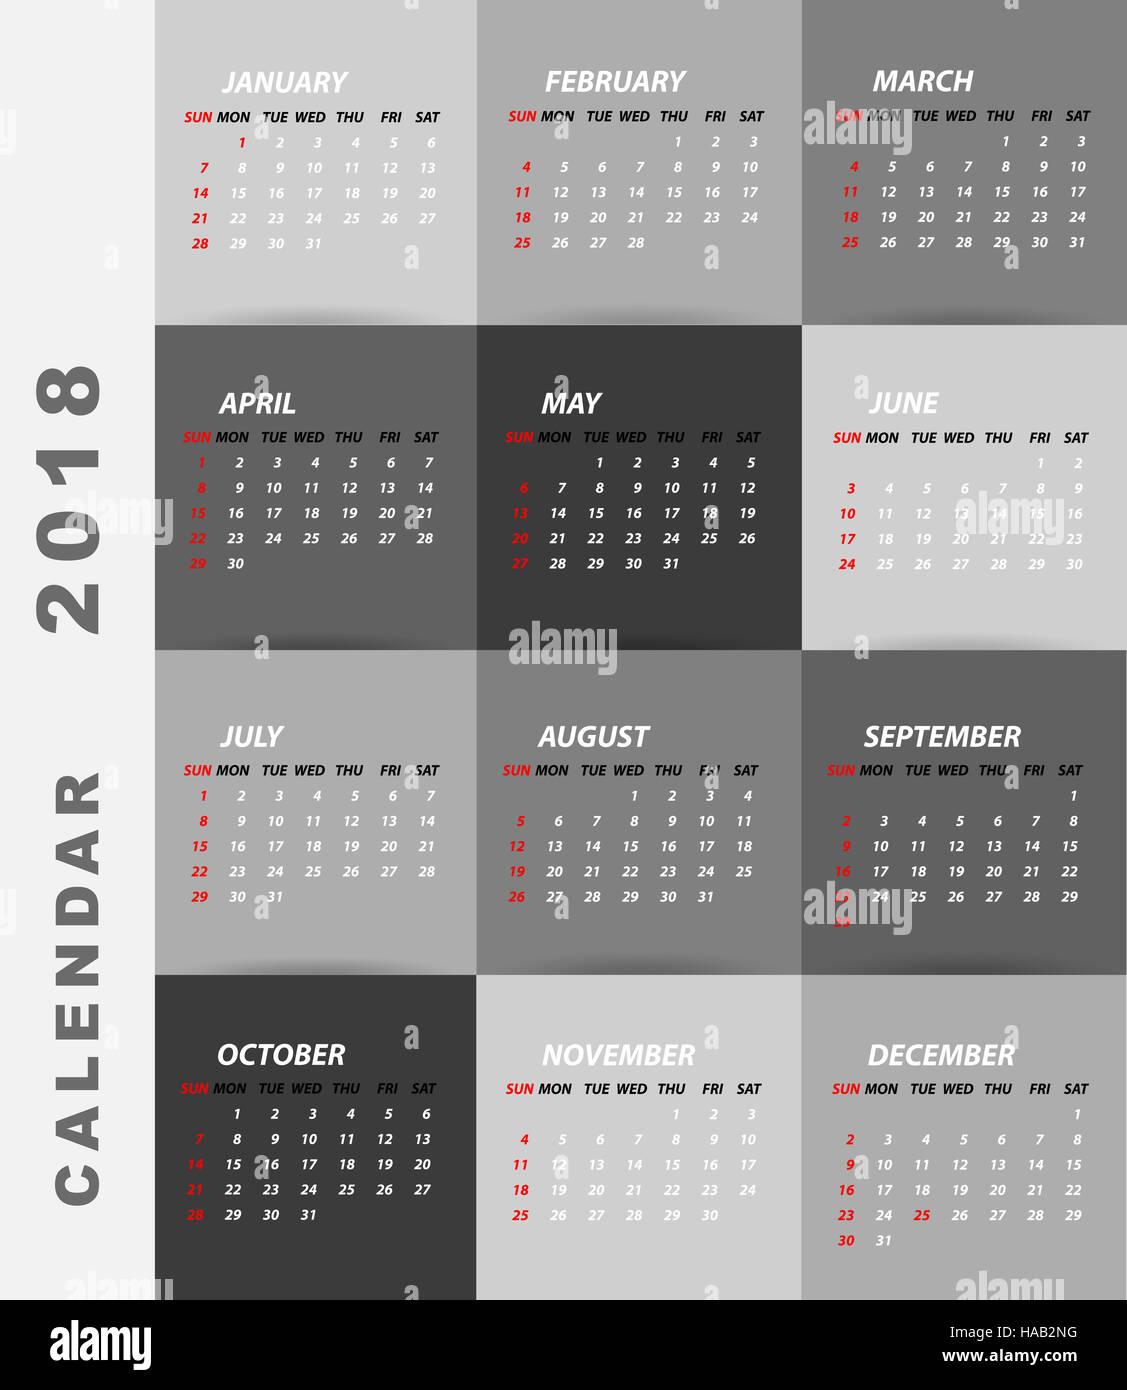 Minimalist Calendar Design : Calendar minimalist design stock photo royalty free